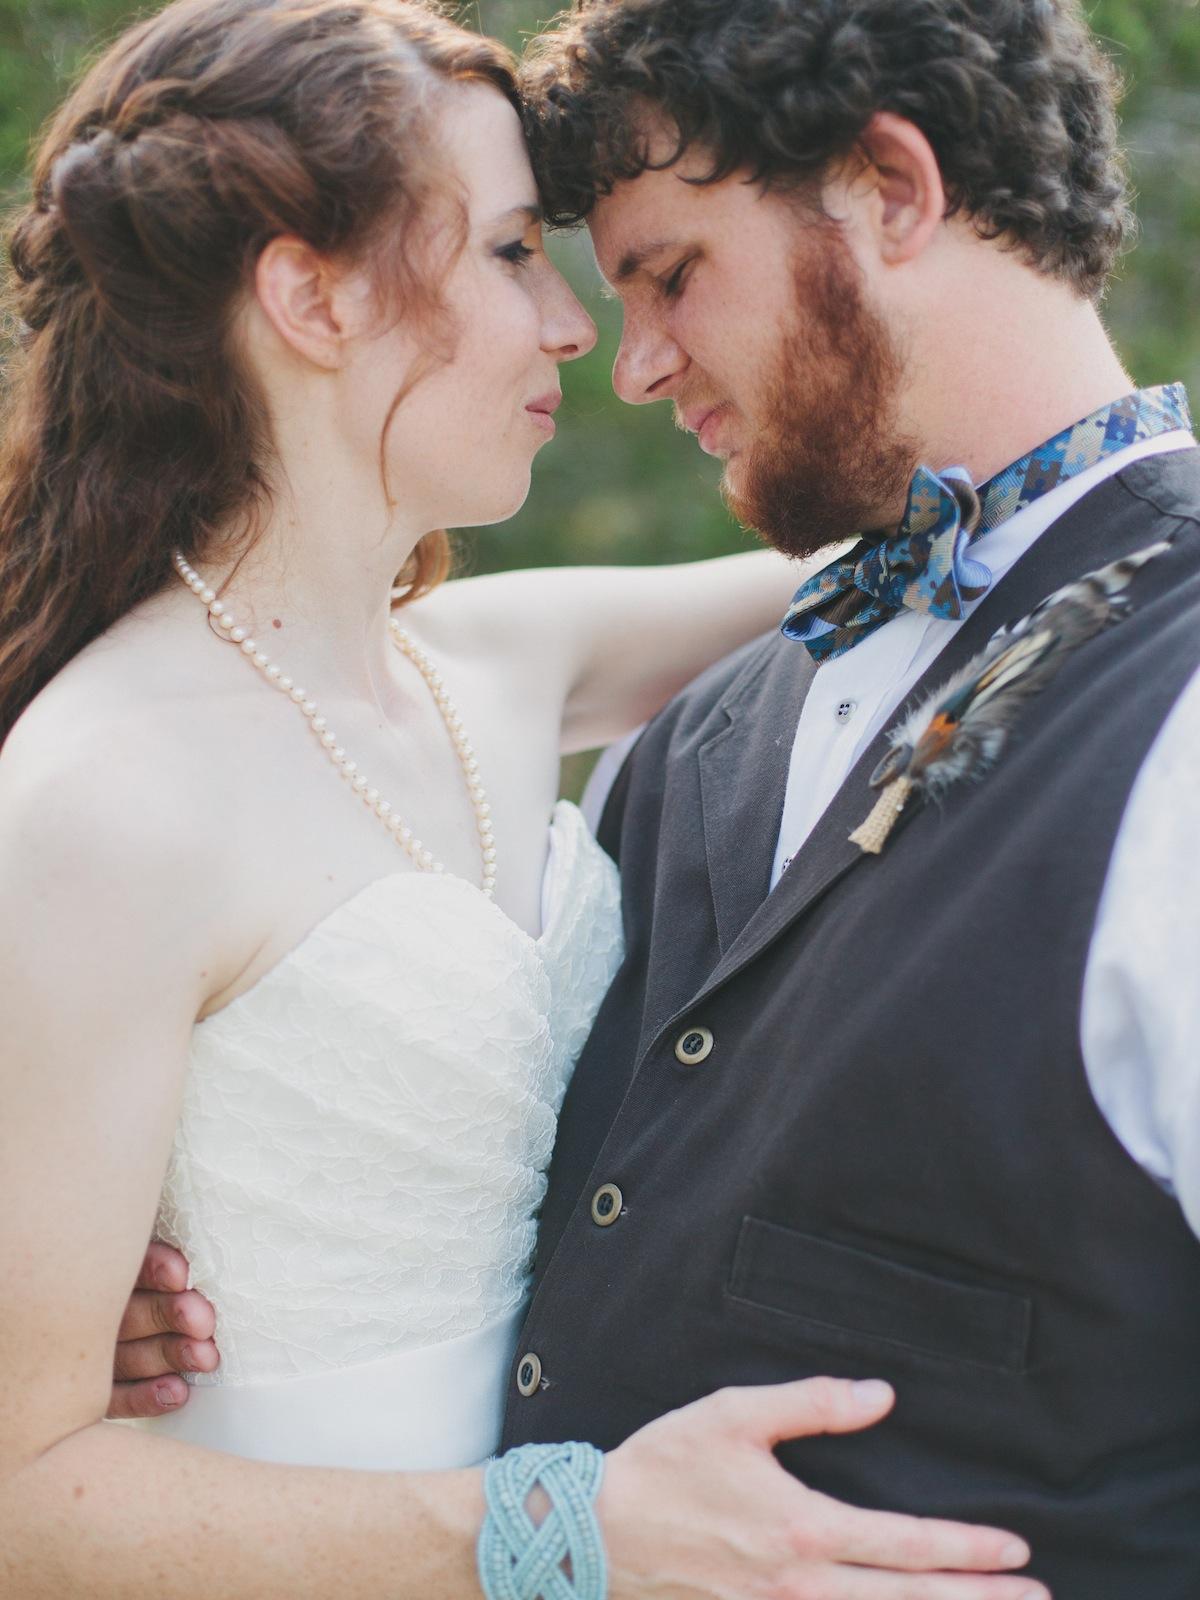 Austin-Wedding-Photographers-Photography-Wildfower-Barn-33.jpg